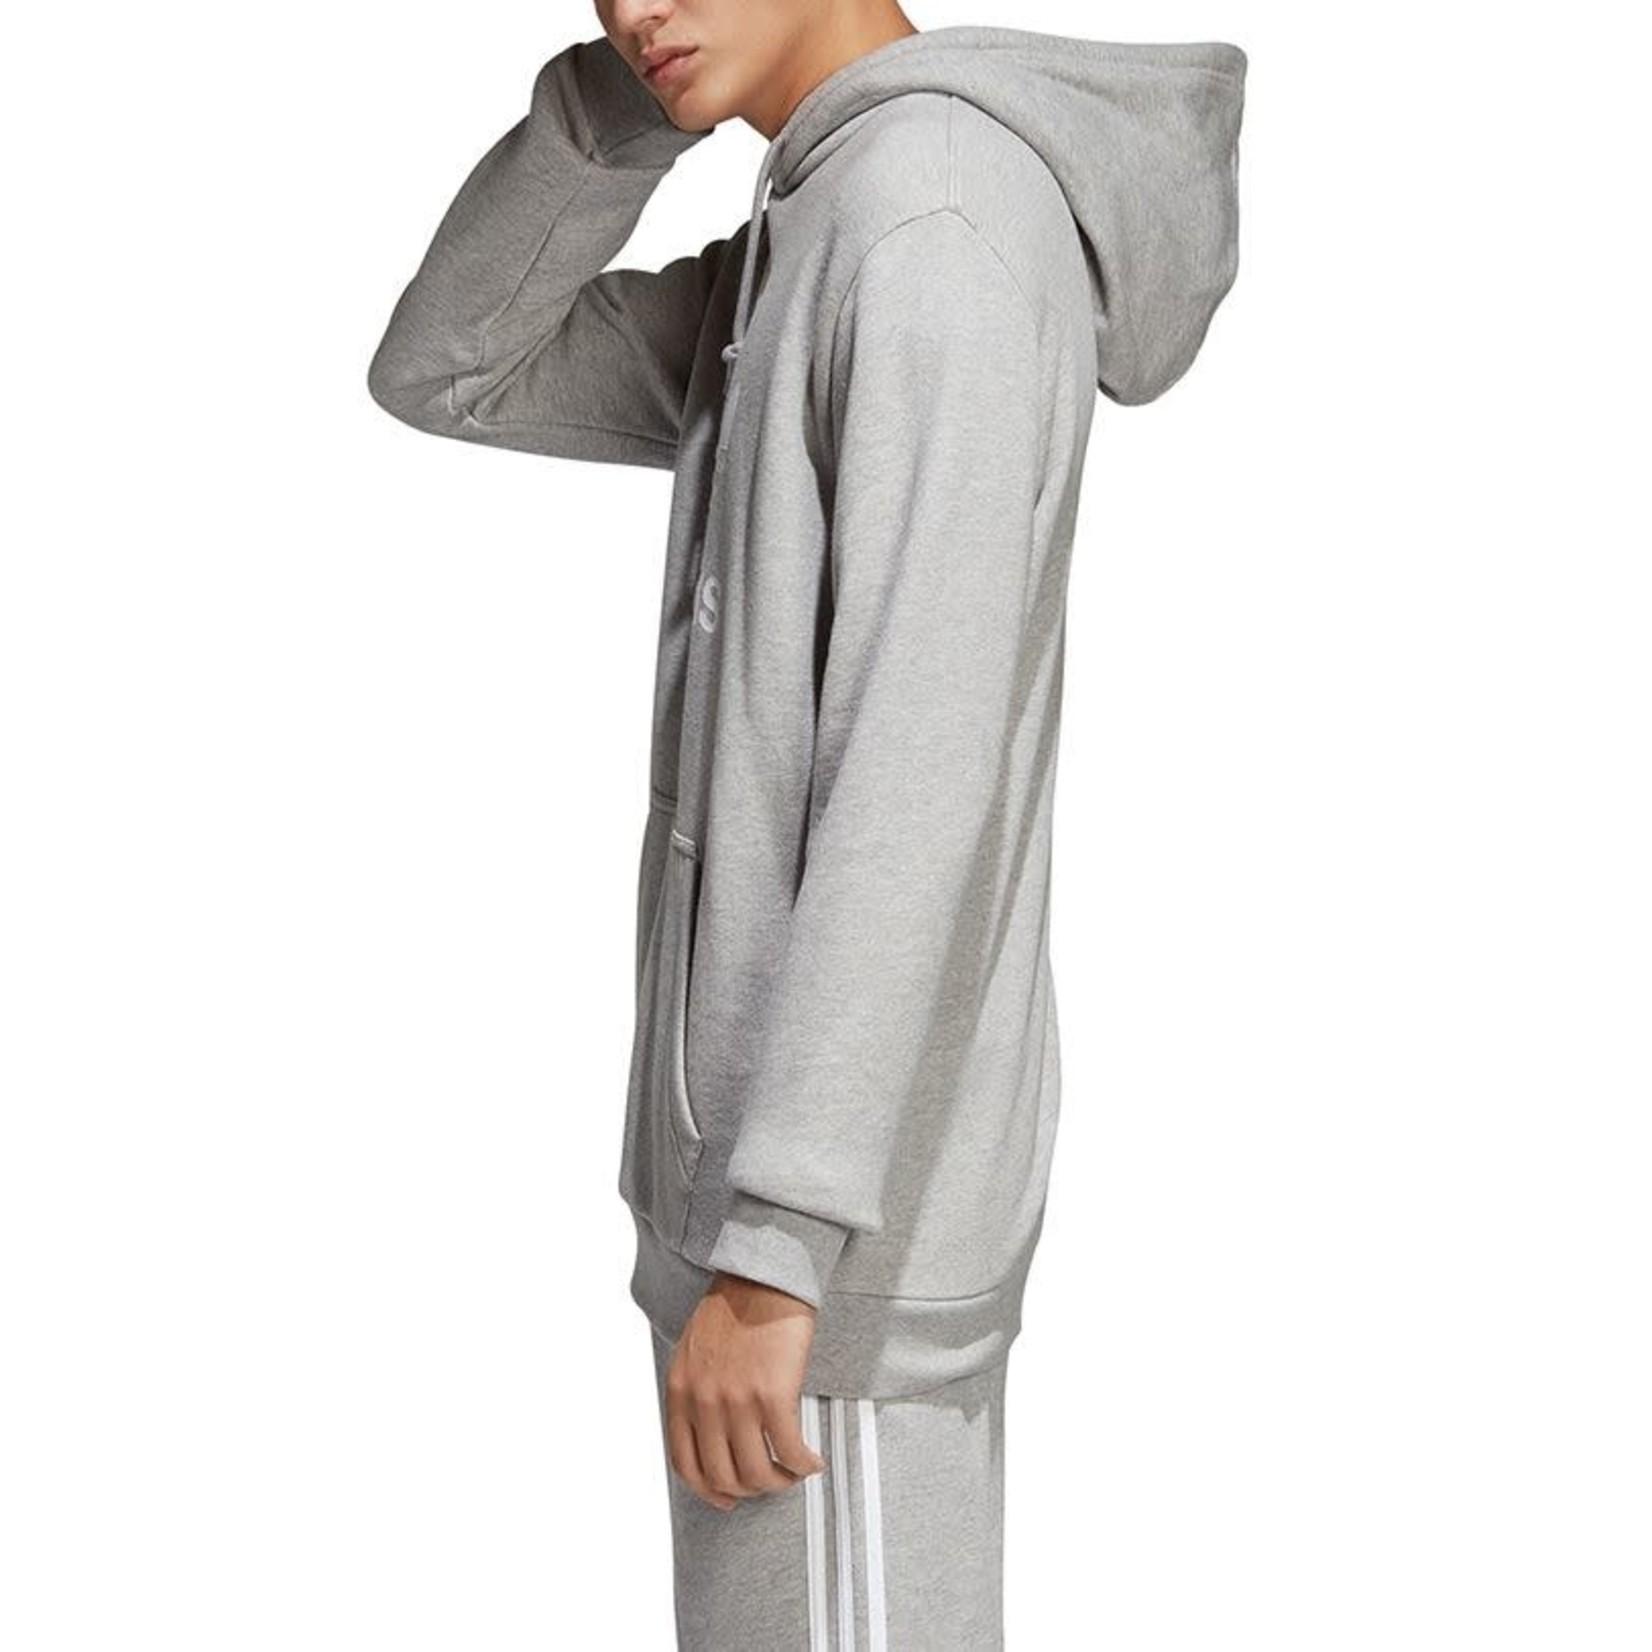 Adidas adidas Apparel : Trefoil Hoodie - 00193821